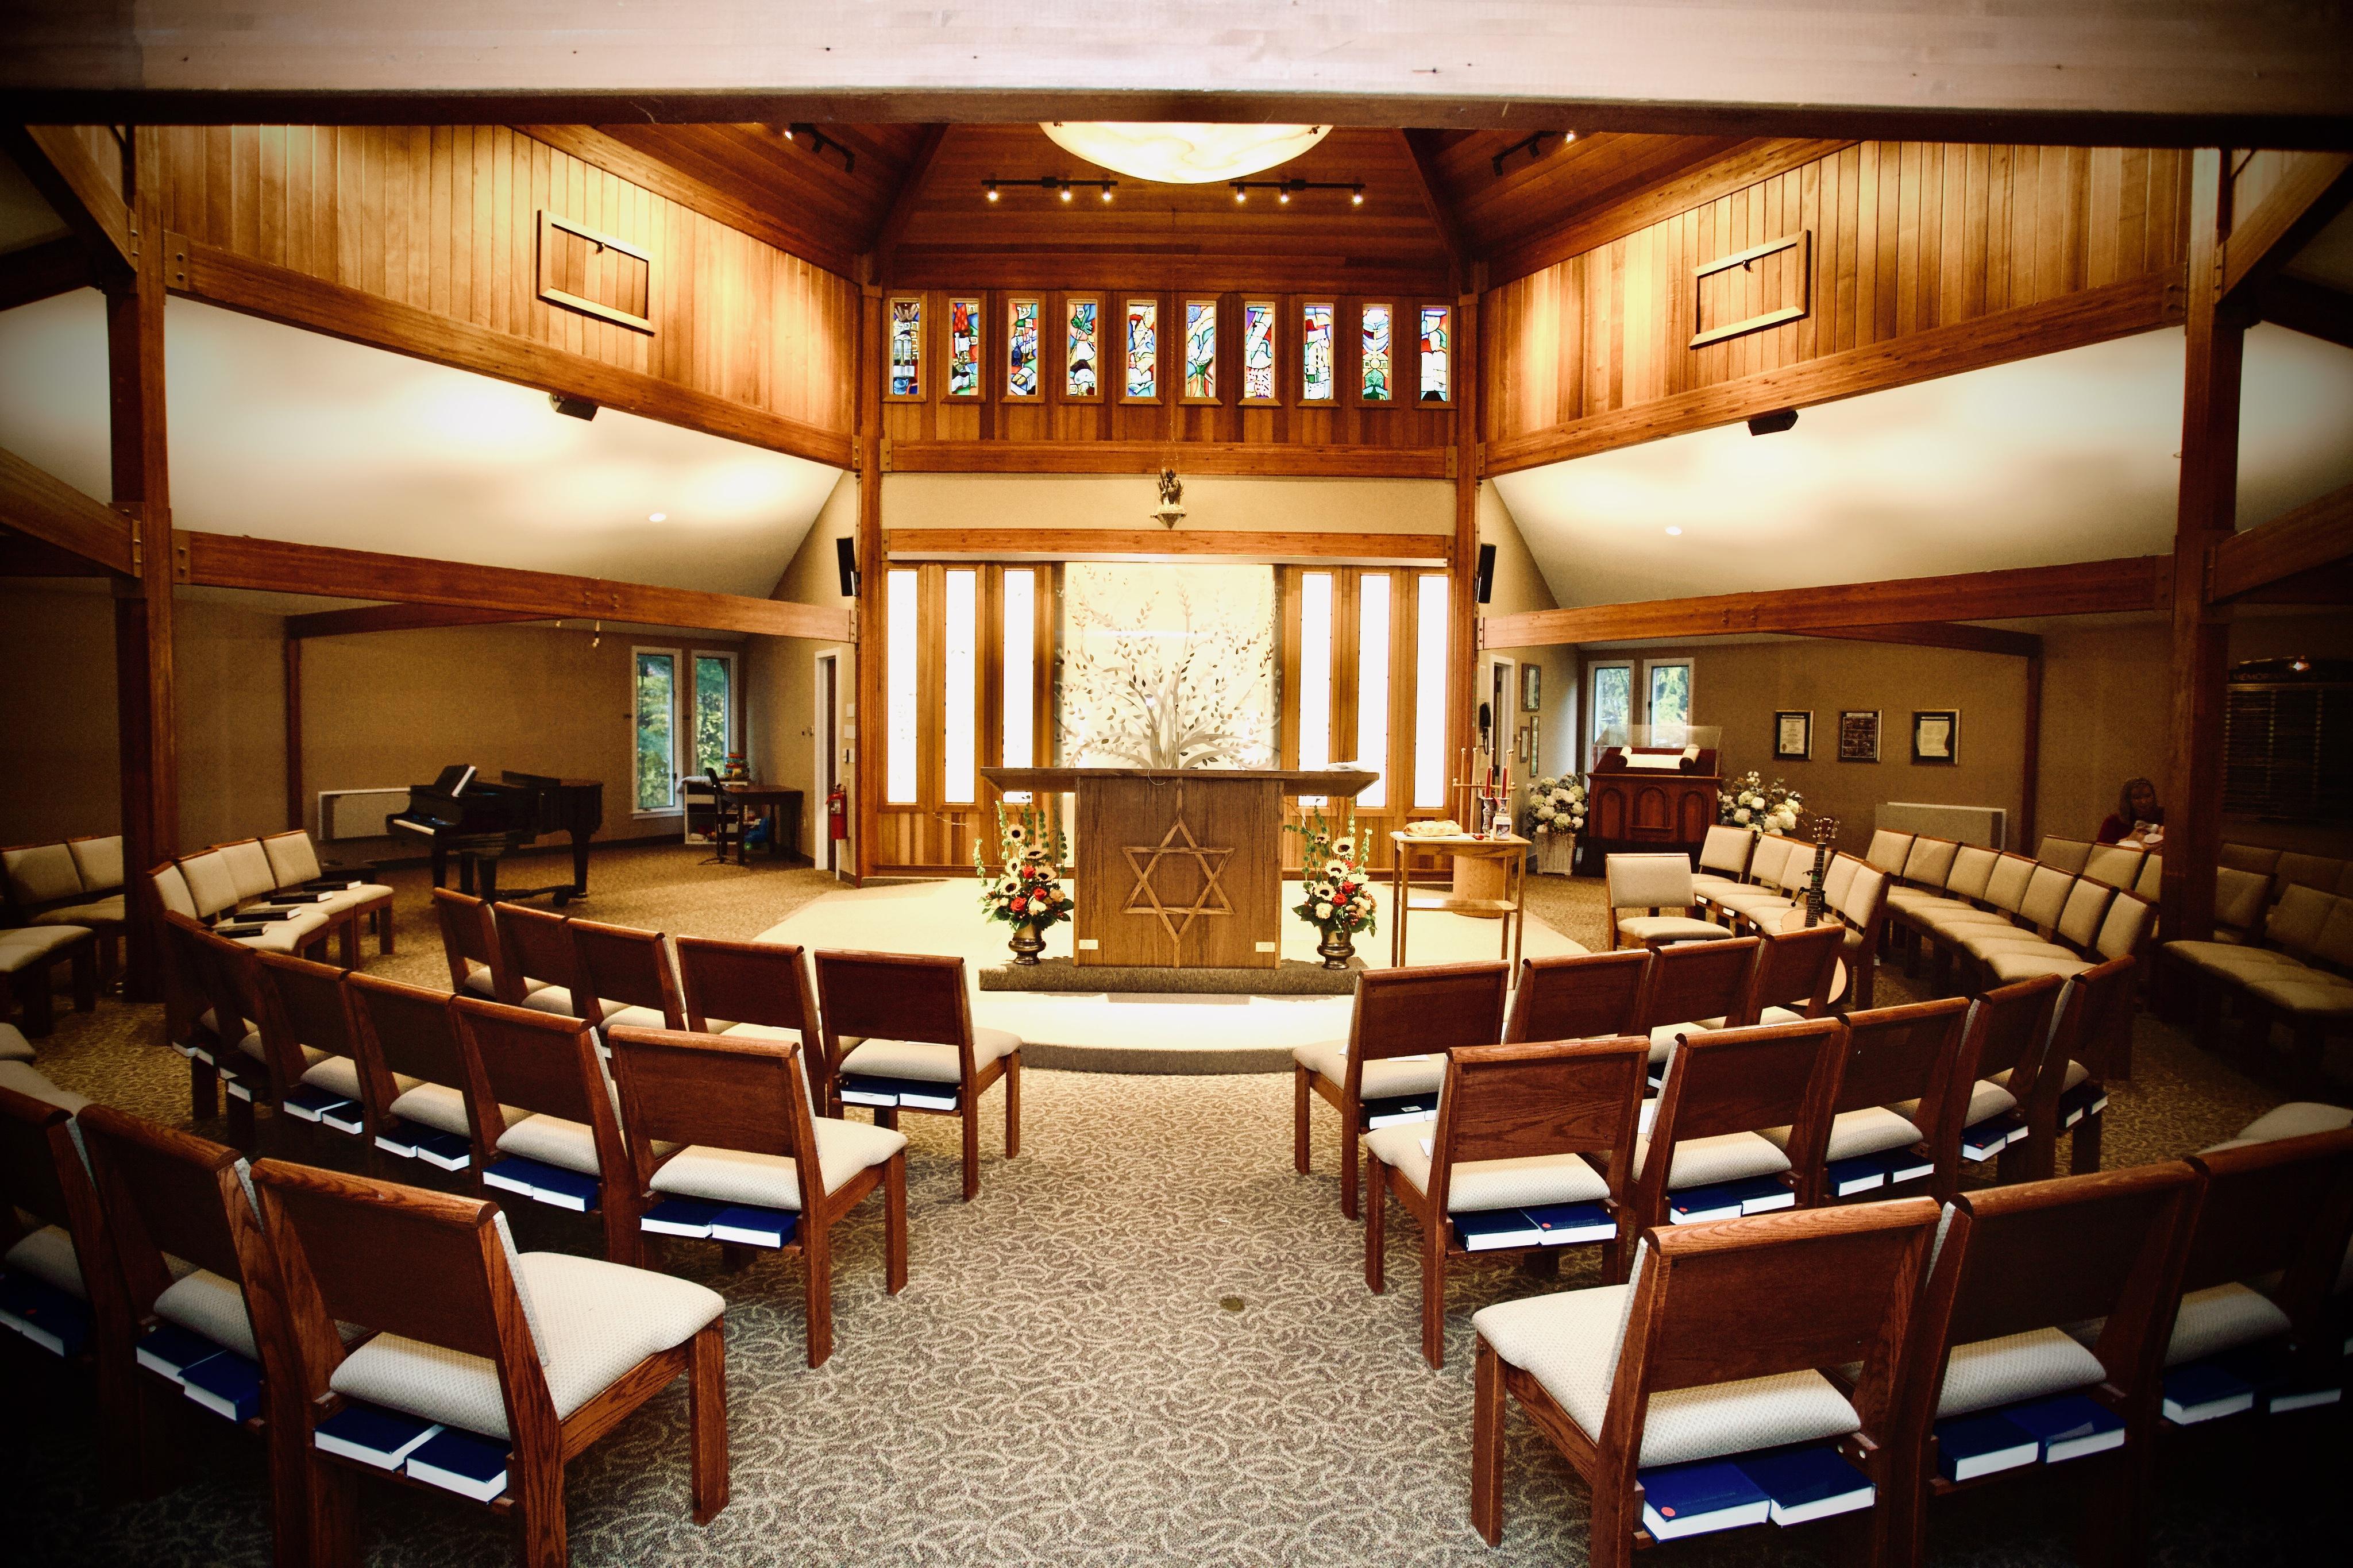 ONLINE RELIGIOUS SERVICES